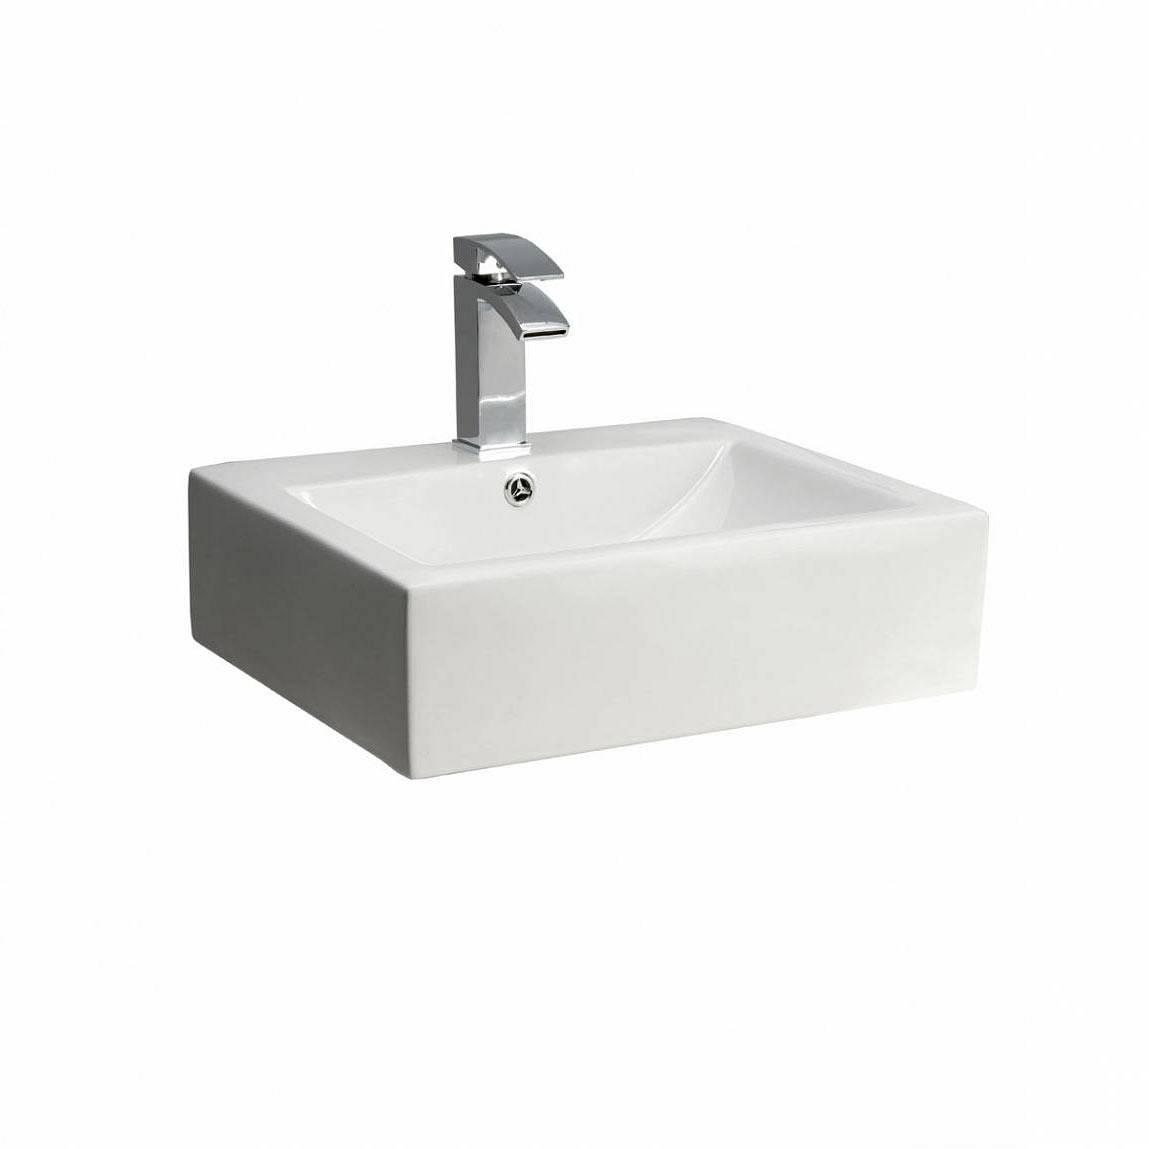 Image of Quadra Counter Top Basin